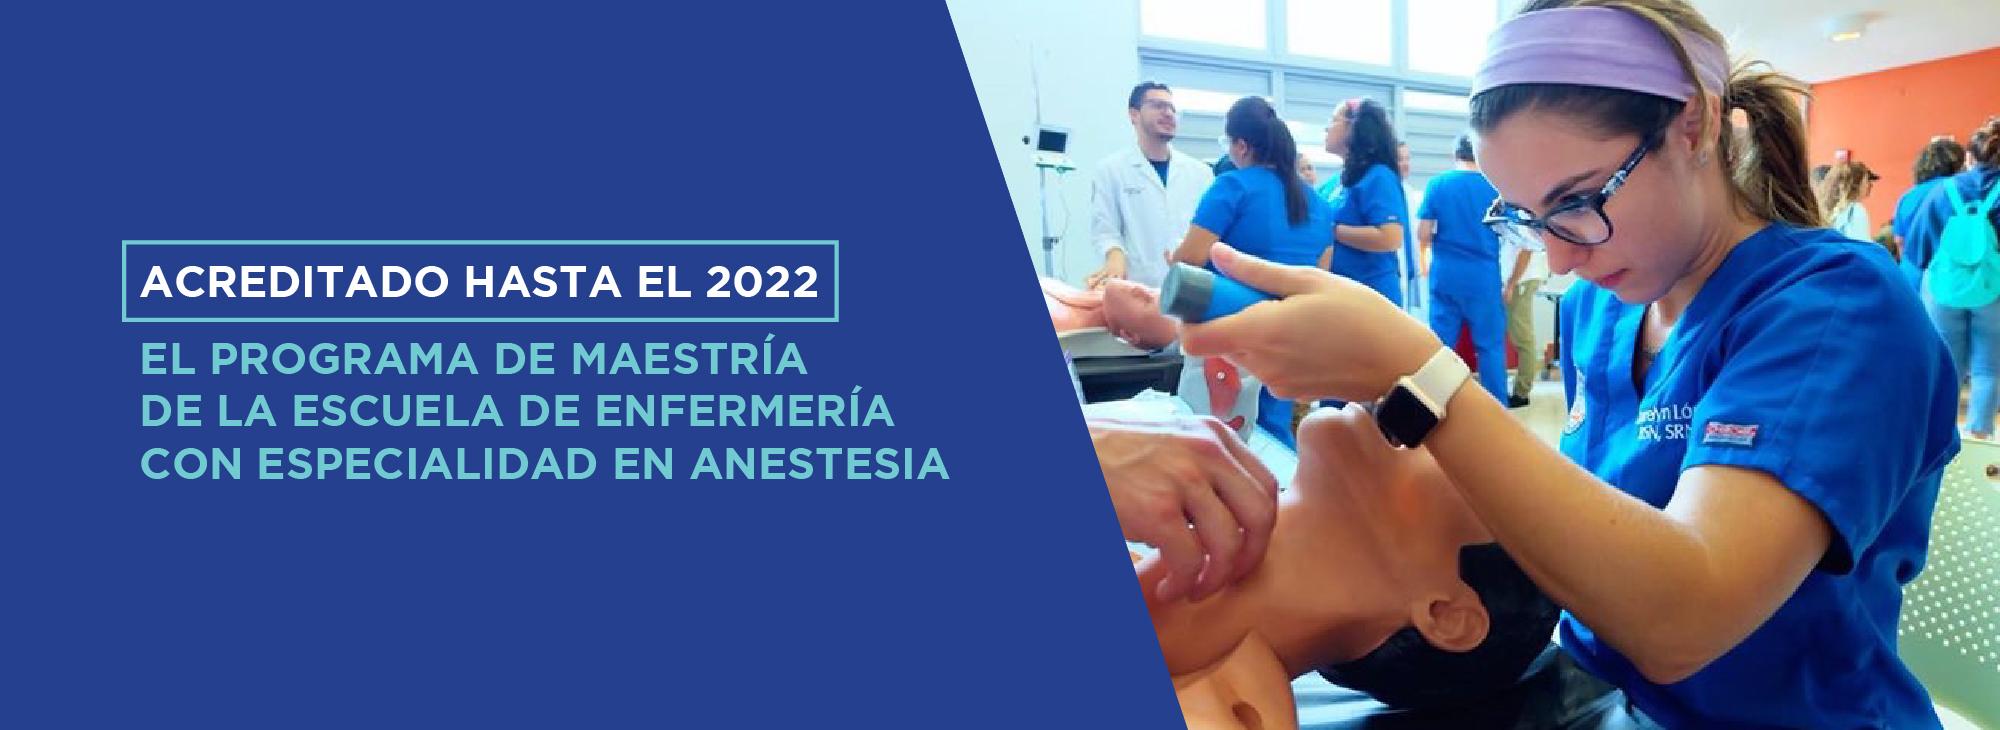 Slider anestesia